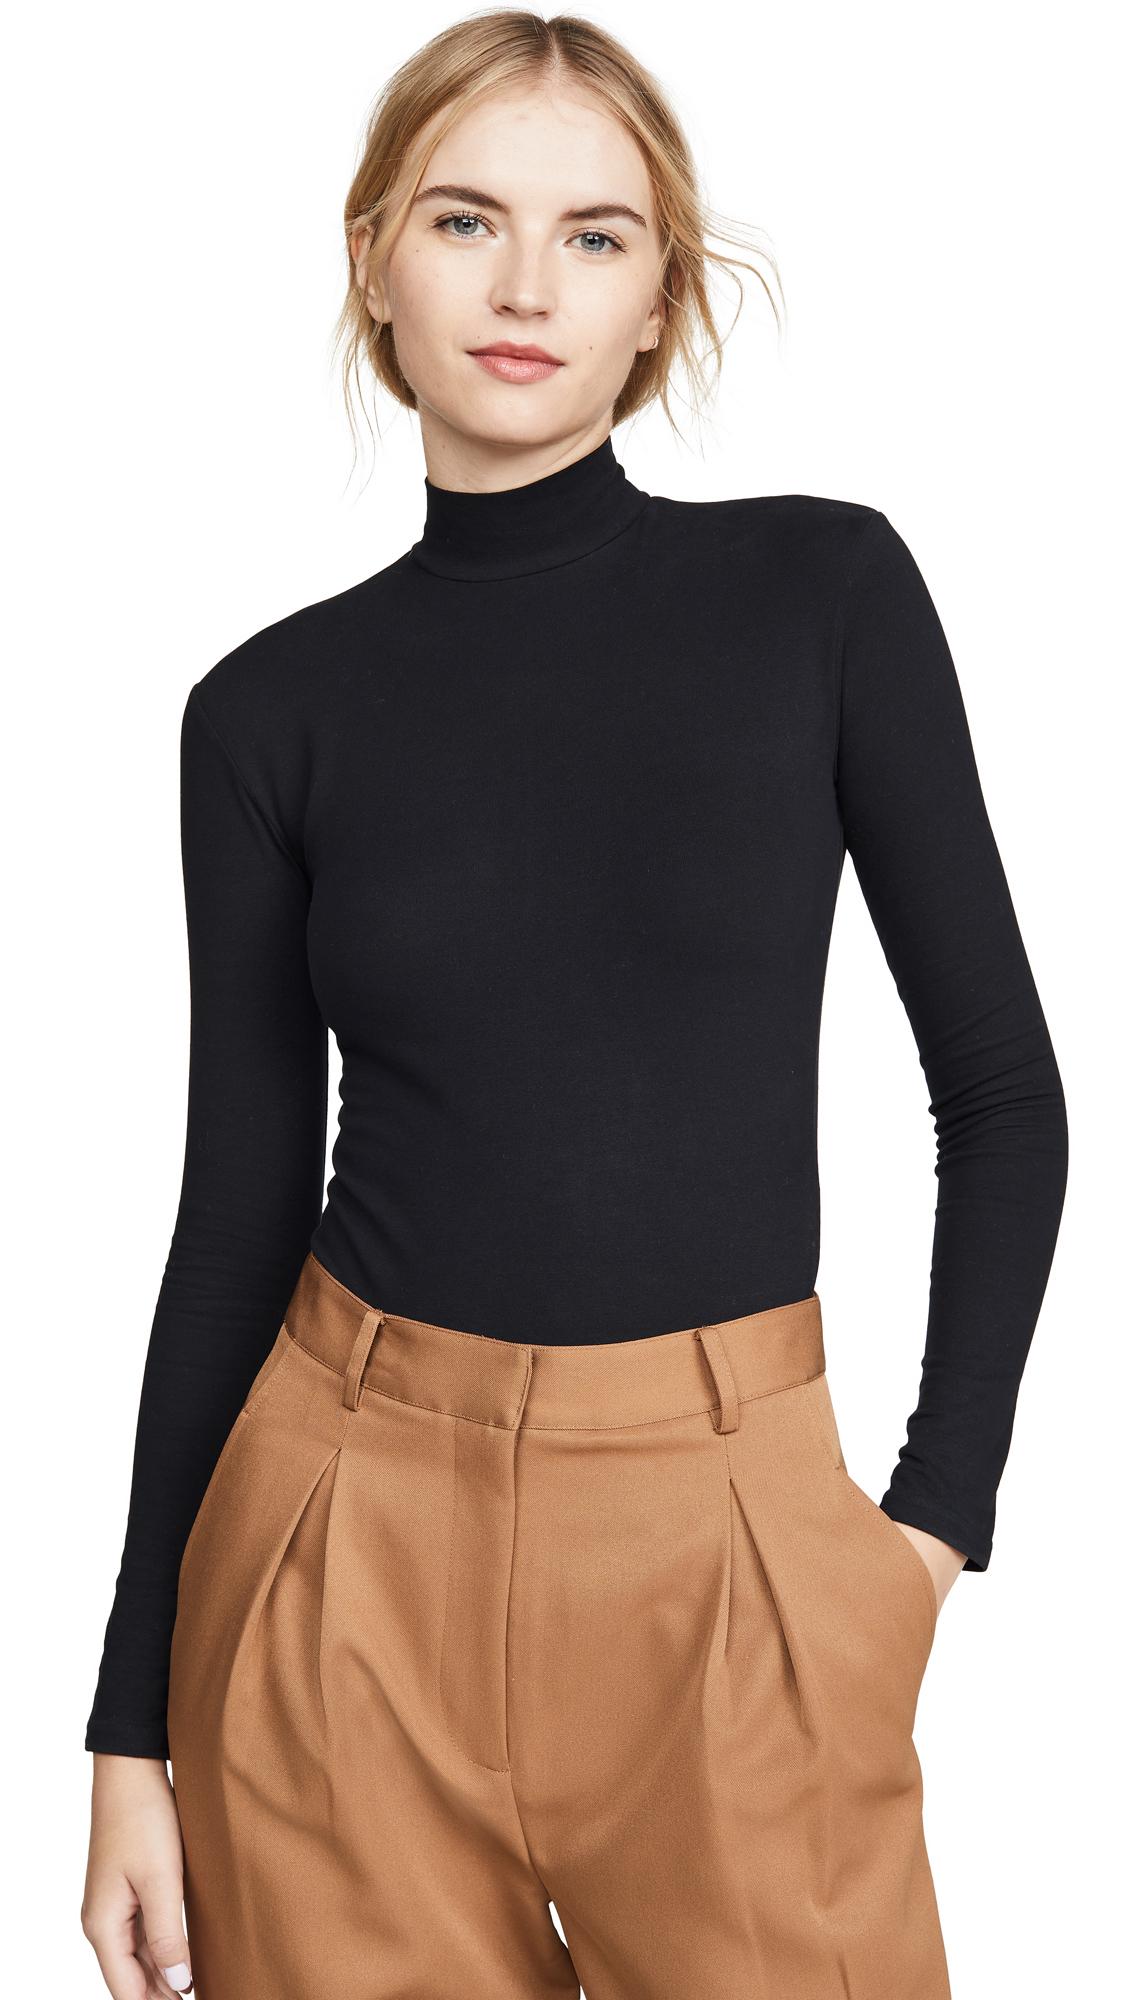 Acne Studios Emargaret Peached T-Shirt Bodysuit - Black